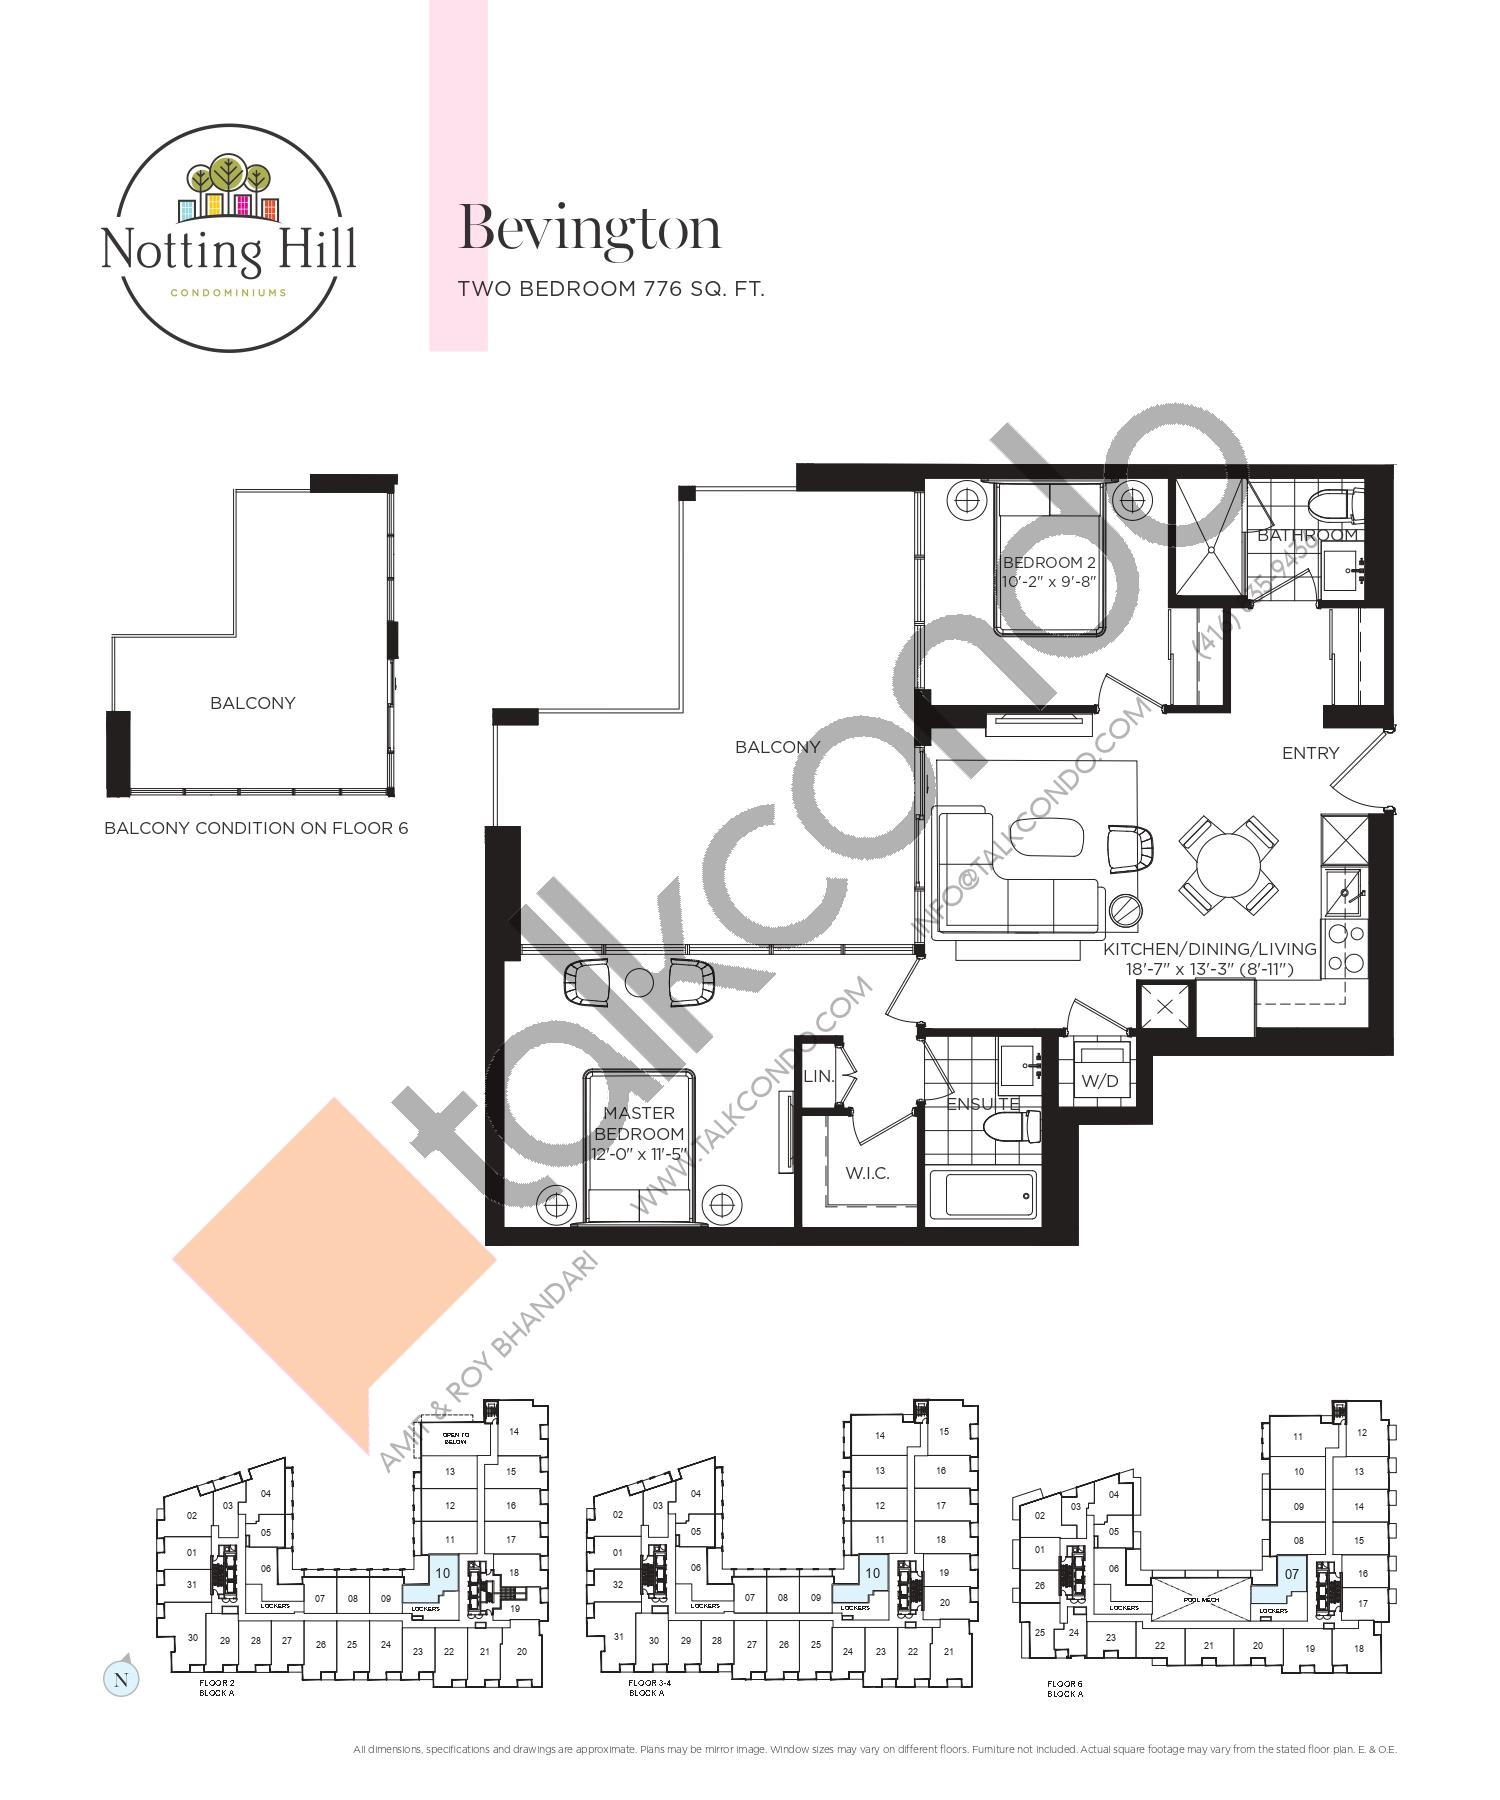 Bevington Floor Plan at Notting Hill Phase 2 Condos - 776 sq.ft